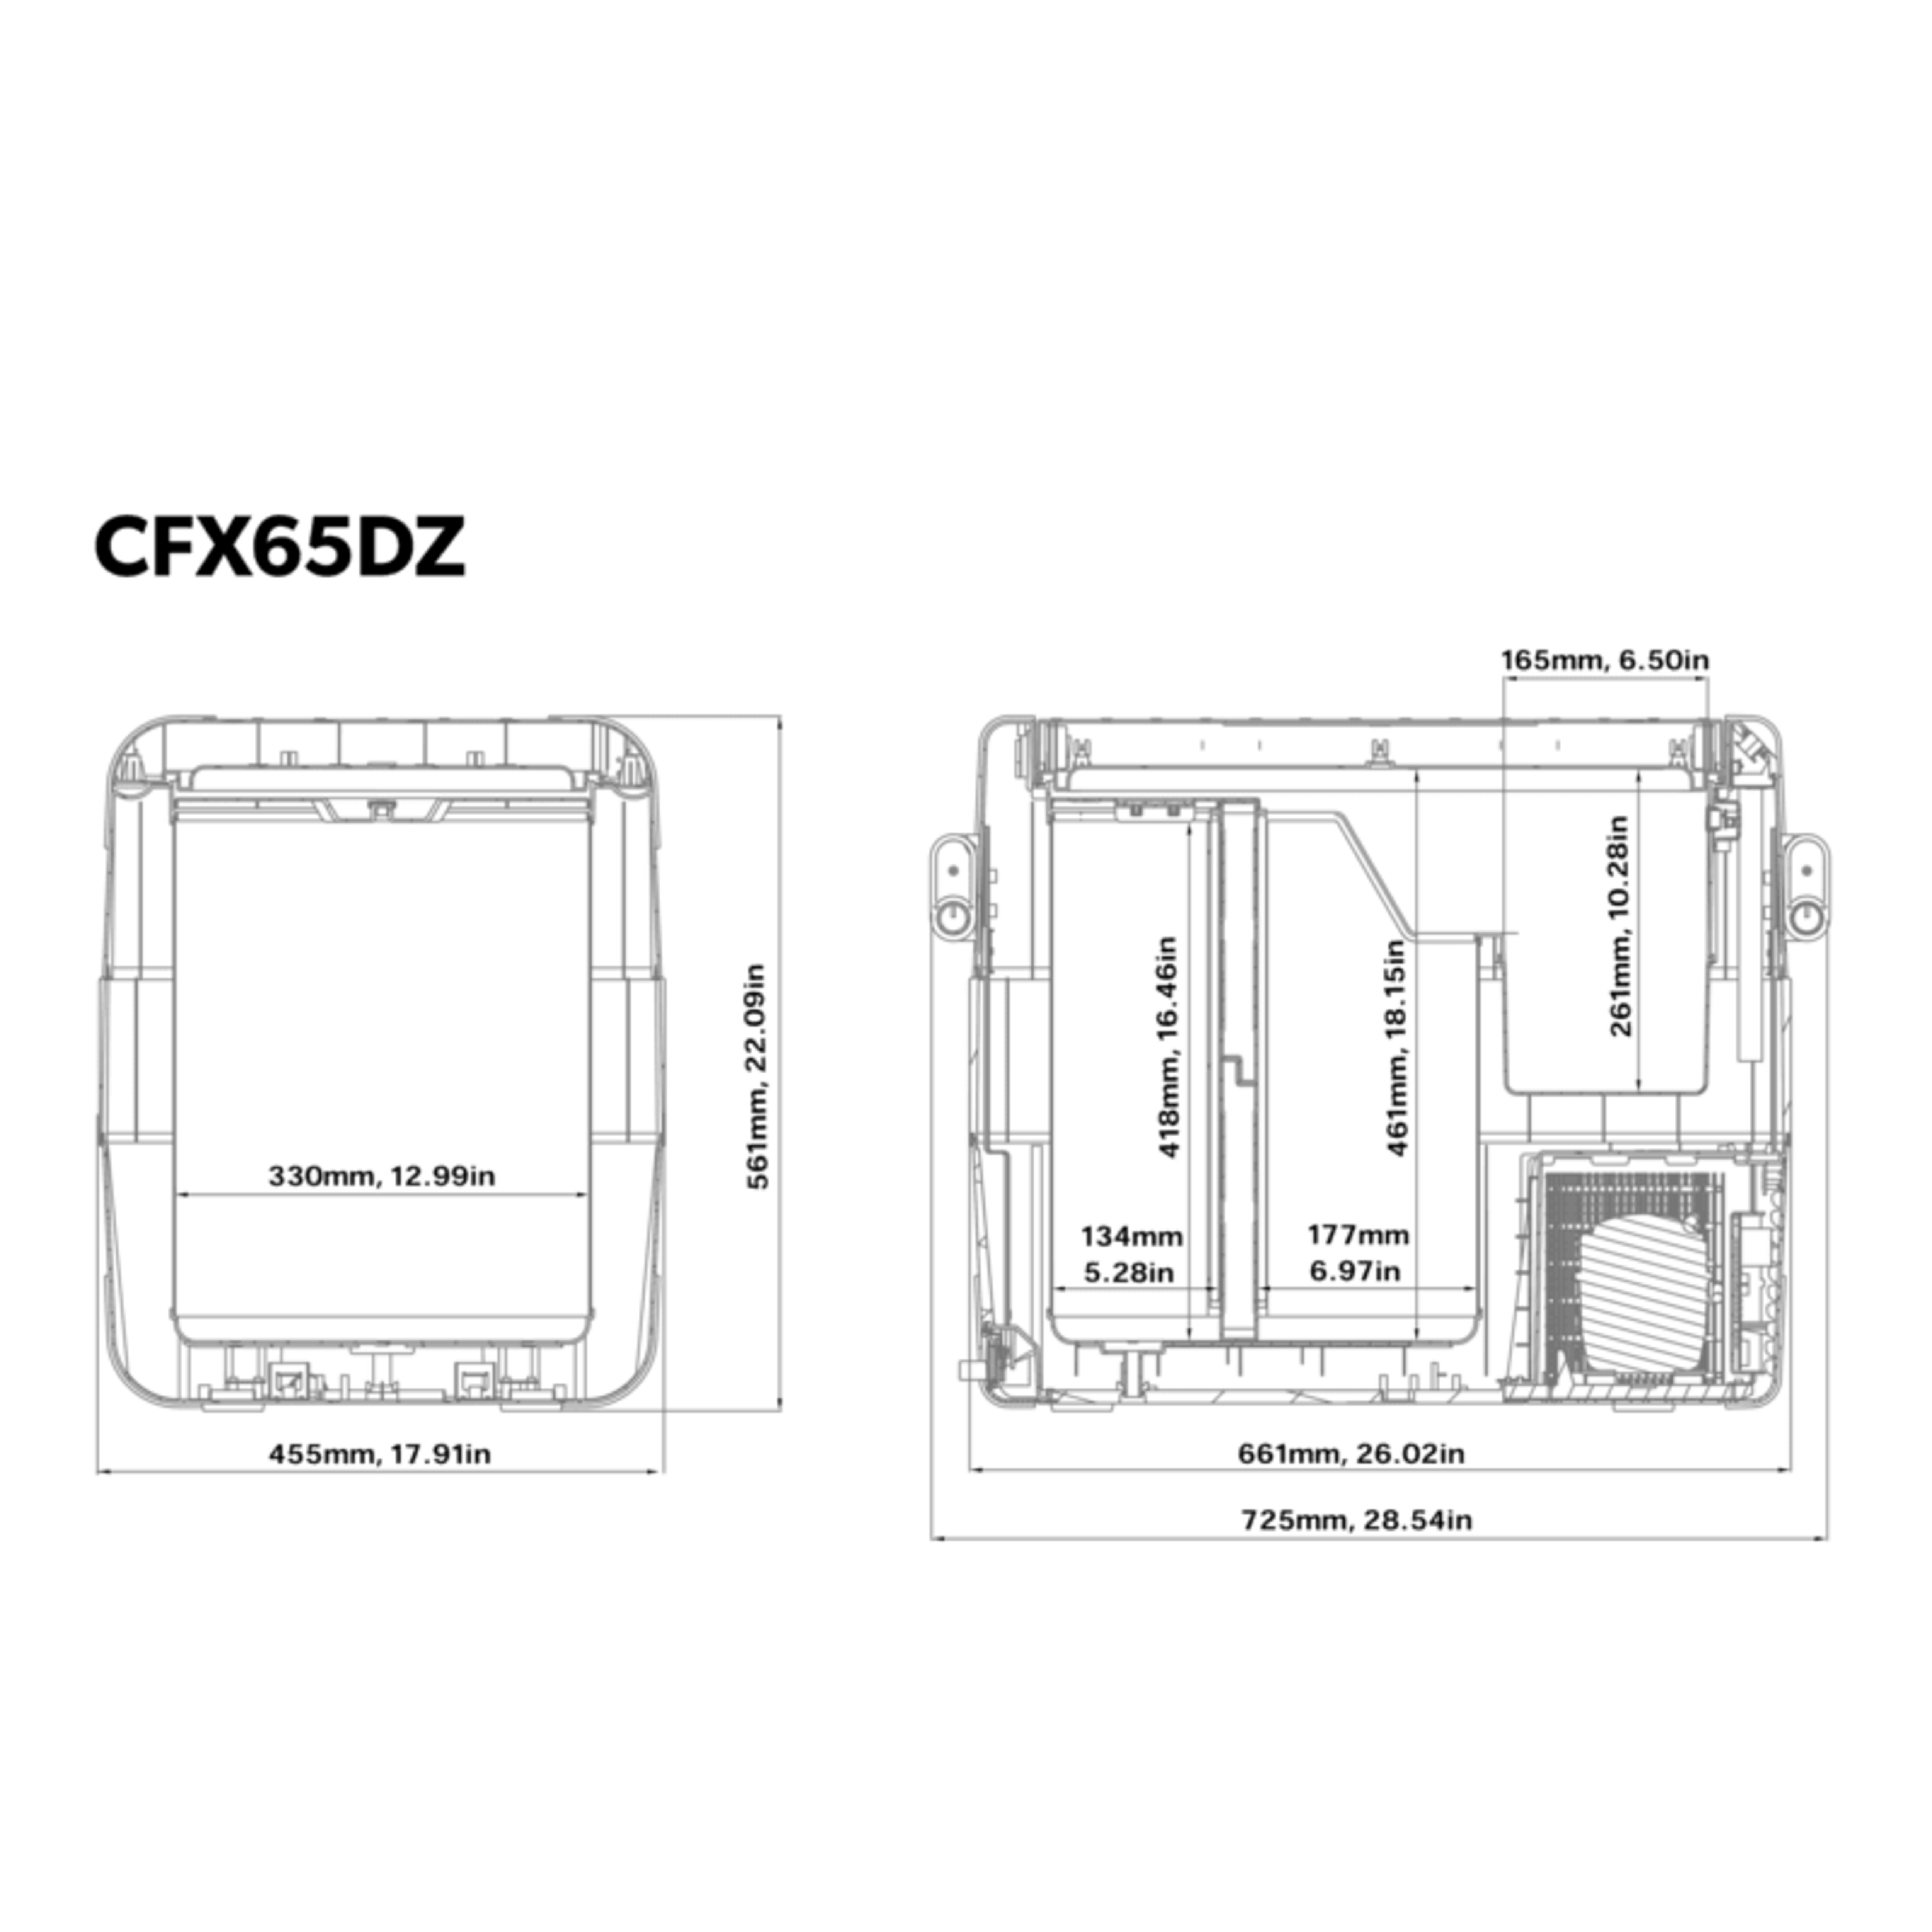 CFX 65DZ Dimensions